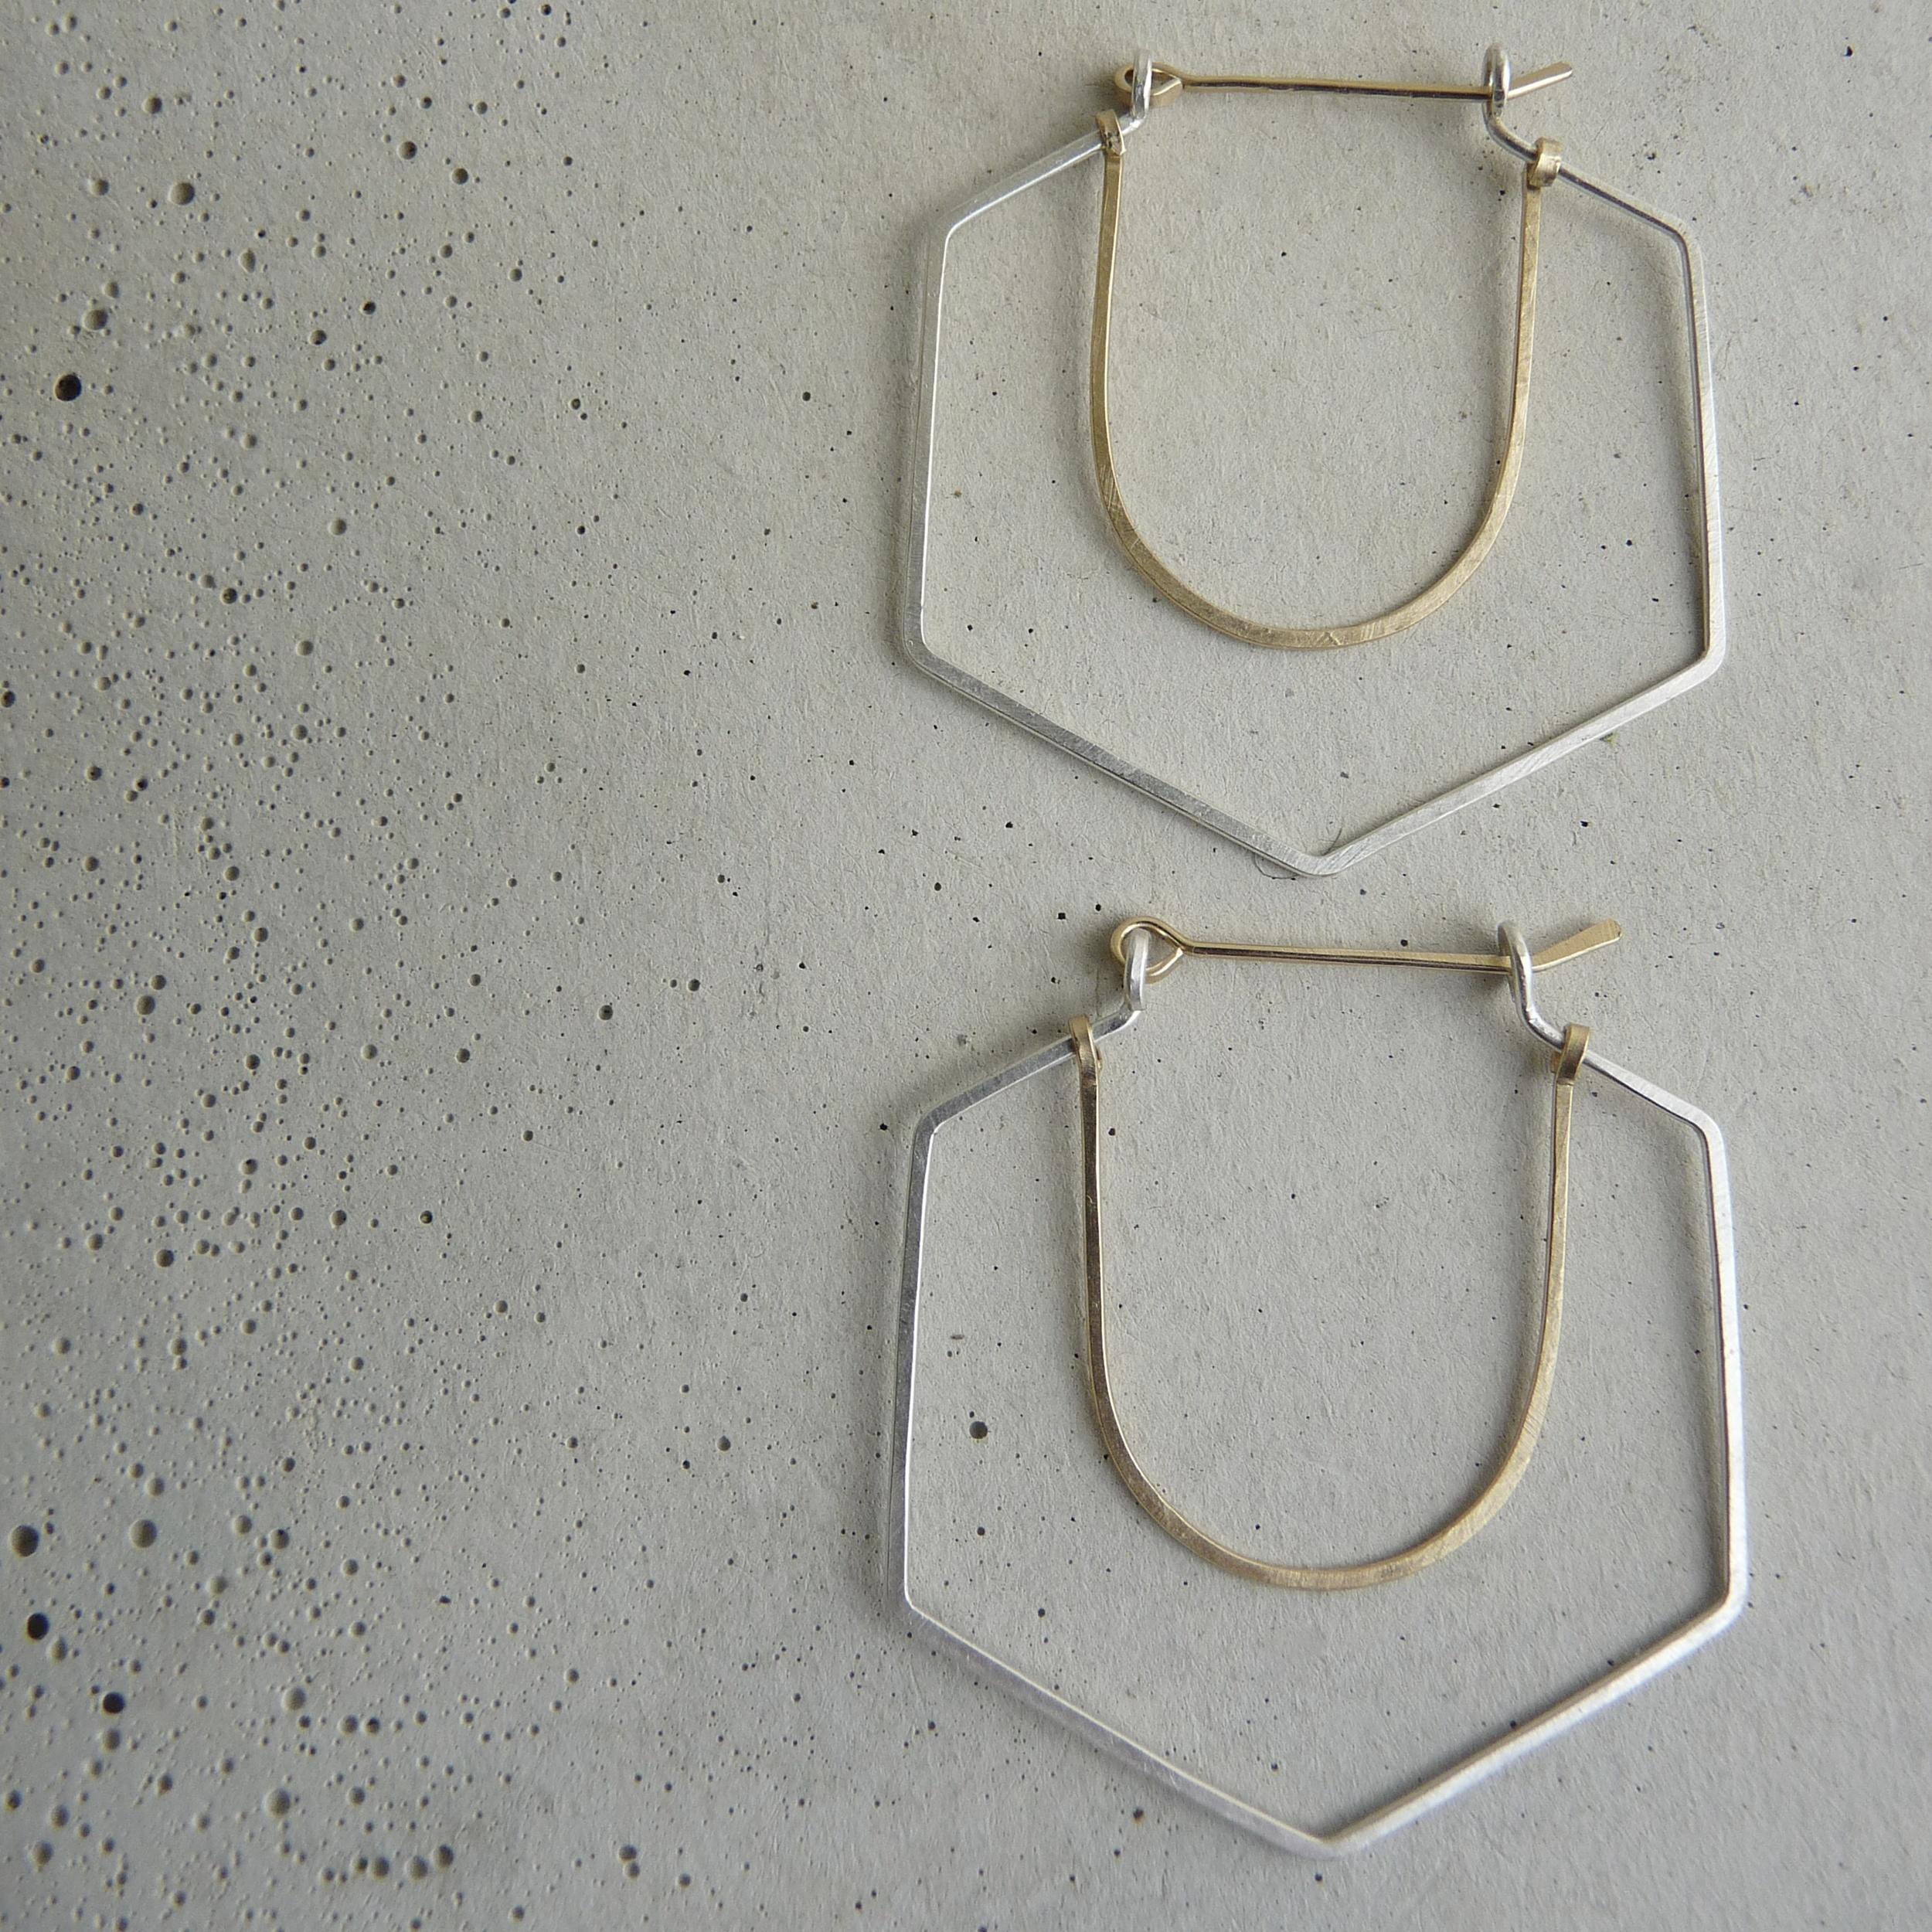 RAVINE hoop earrings, silver and gold geometric hoops, hammered silver hoop earrings, new refined basics